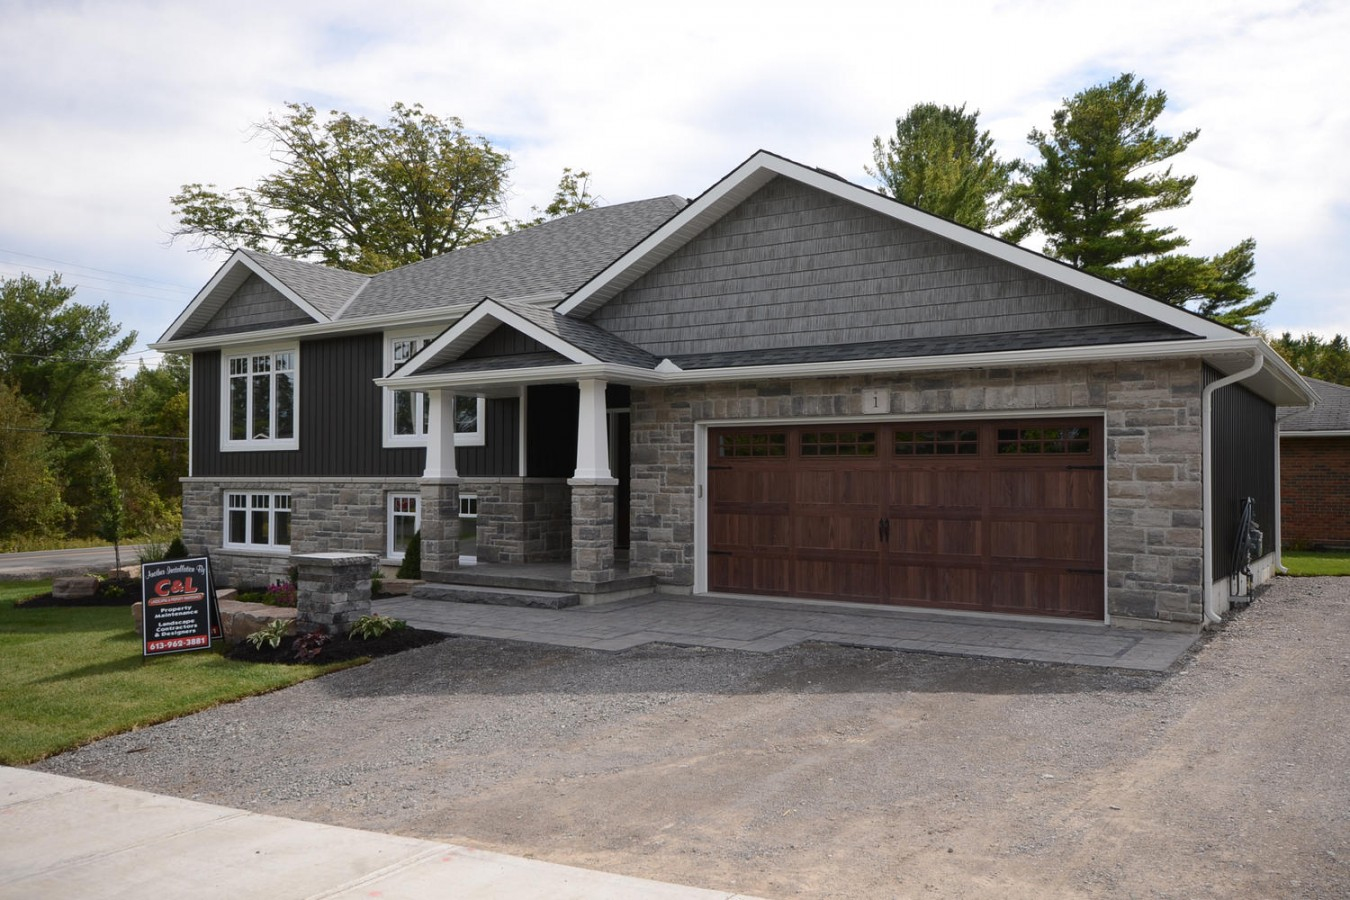 birchmount road model home diamond homes by davis